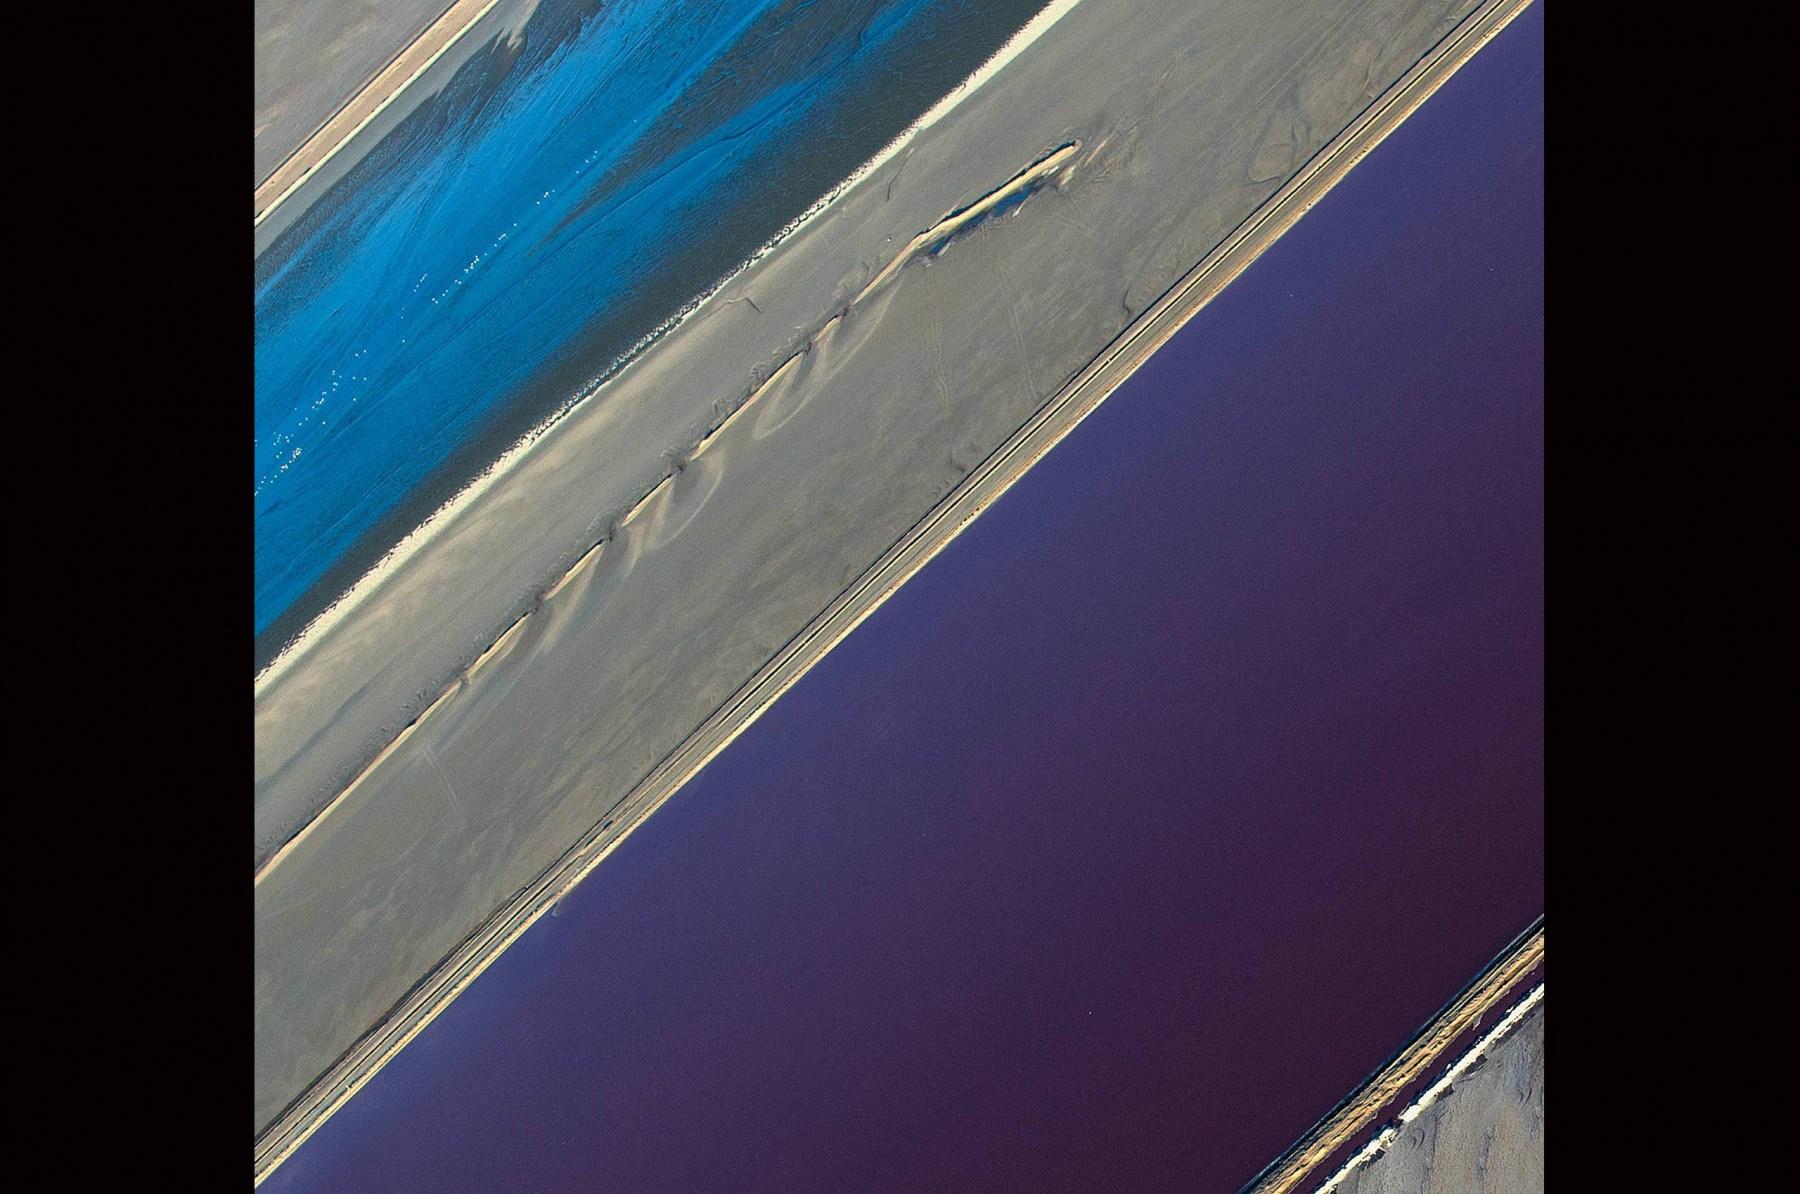 Salt-Pans-Namibia-Aerial